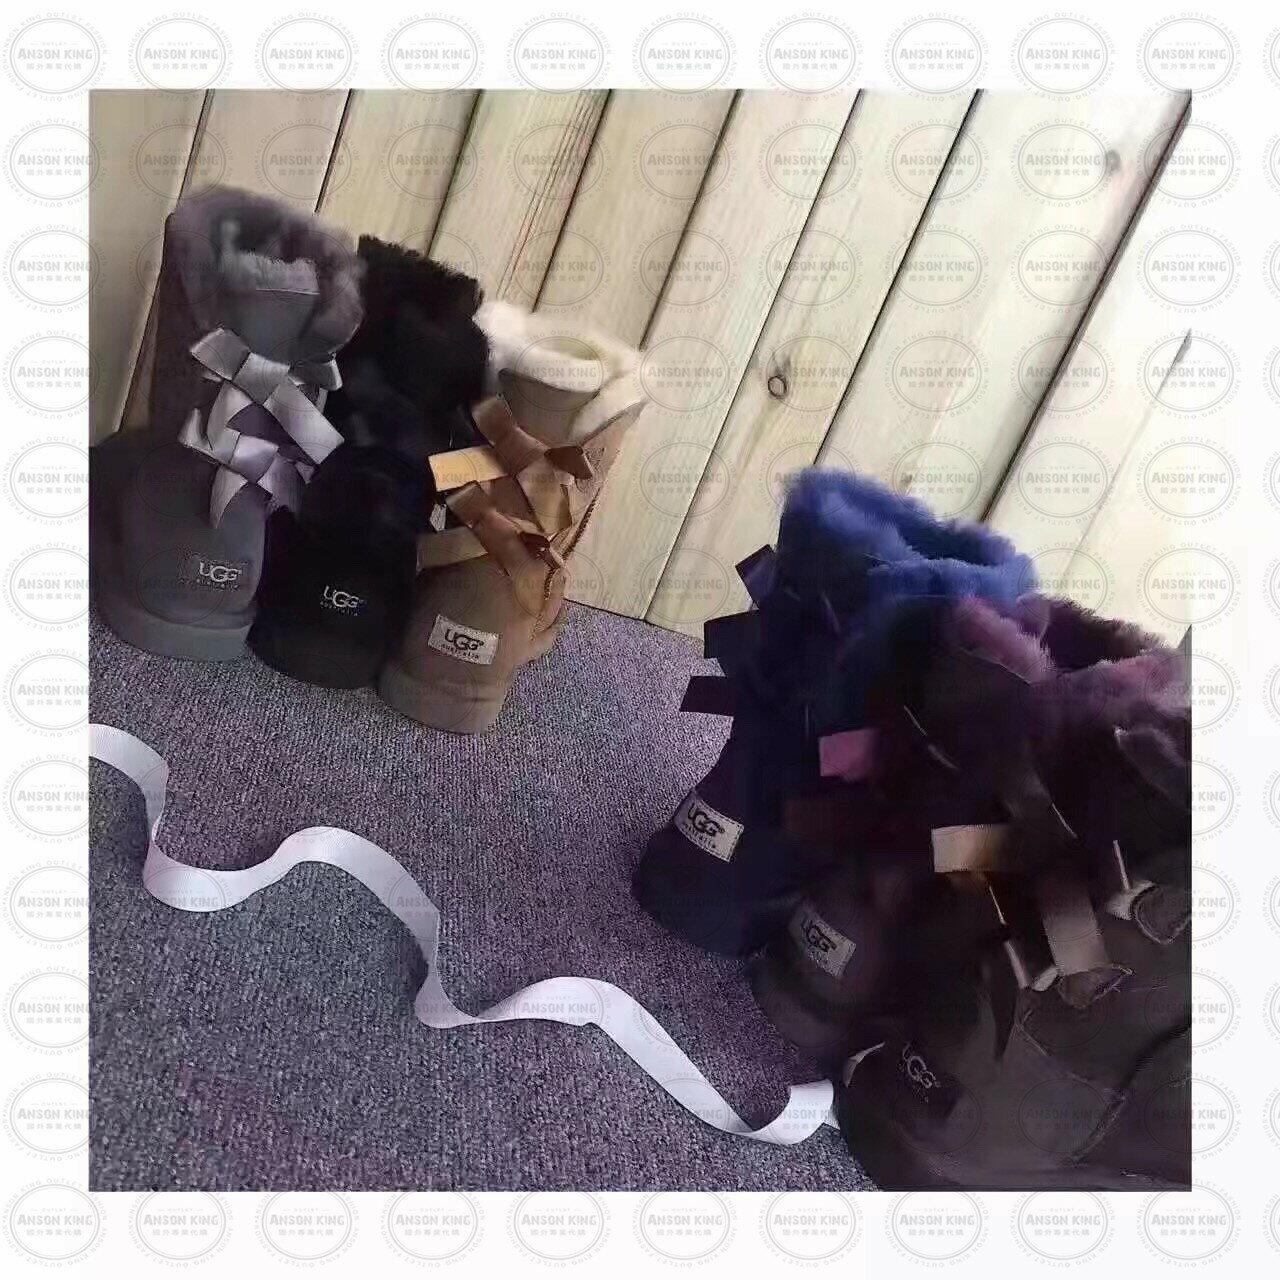 OUTLET正品代購 澳洲 UGG 蝴蝶結3280羊皮毛一體 中長靴 保暖 真皮羊皮毛 雪靴 短靴 紫色 2